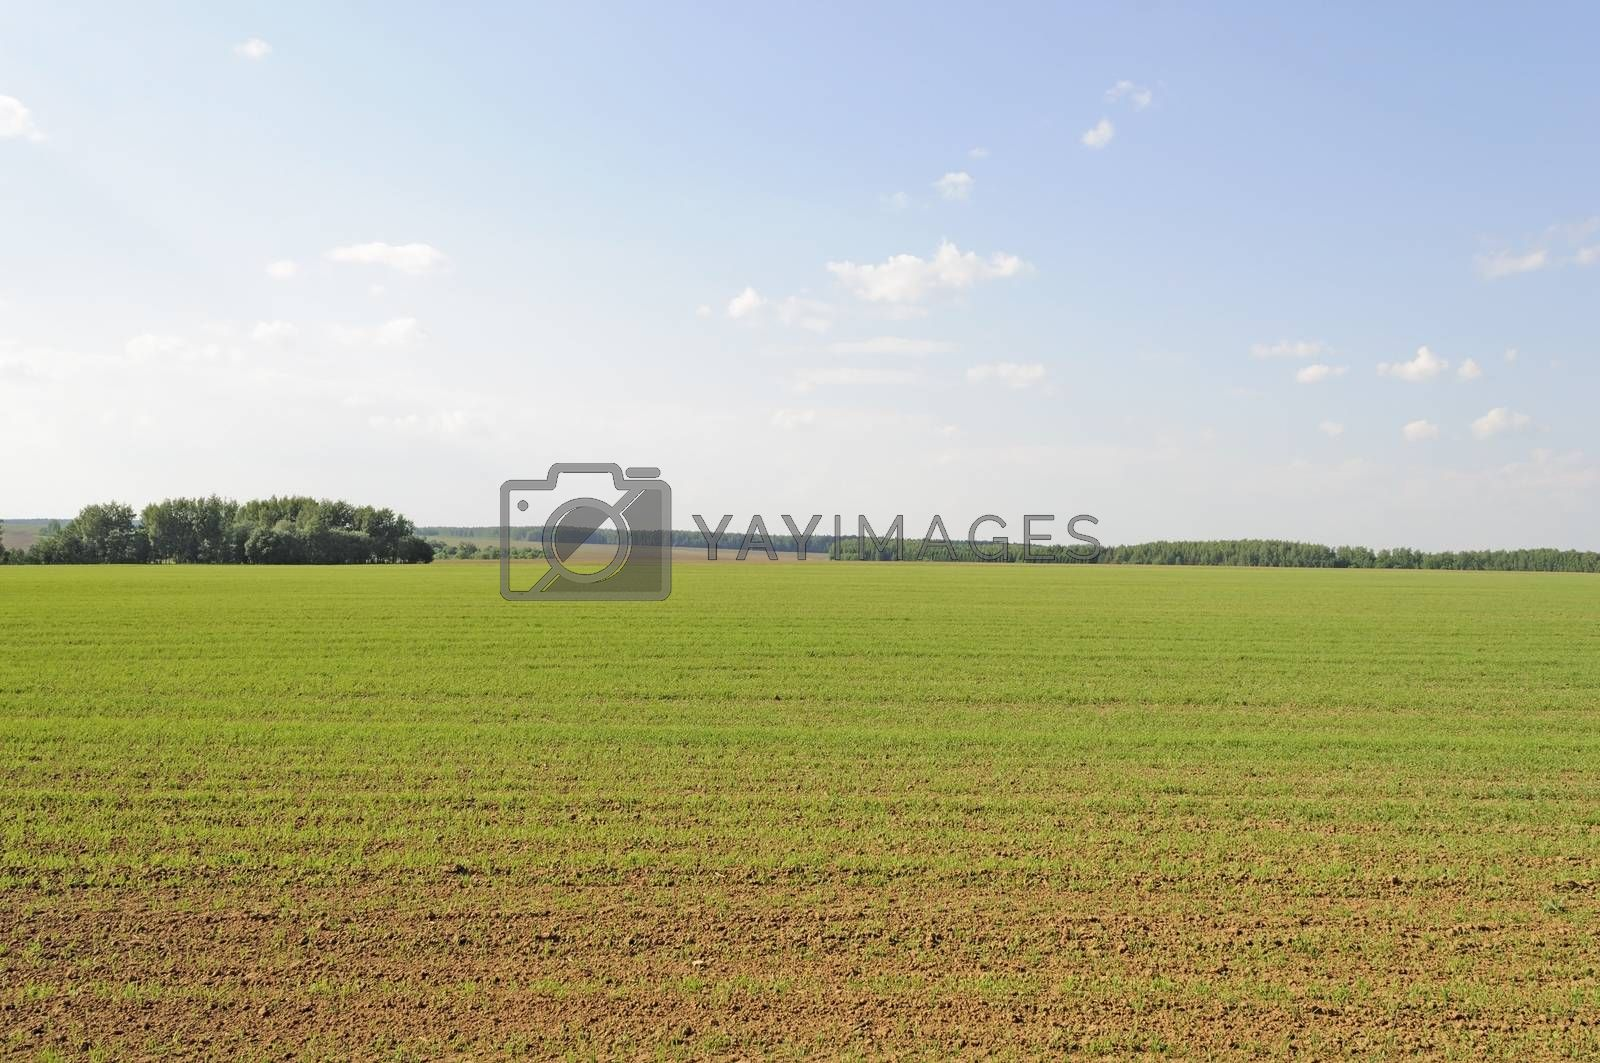 Green shoots of wheat on a farm field